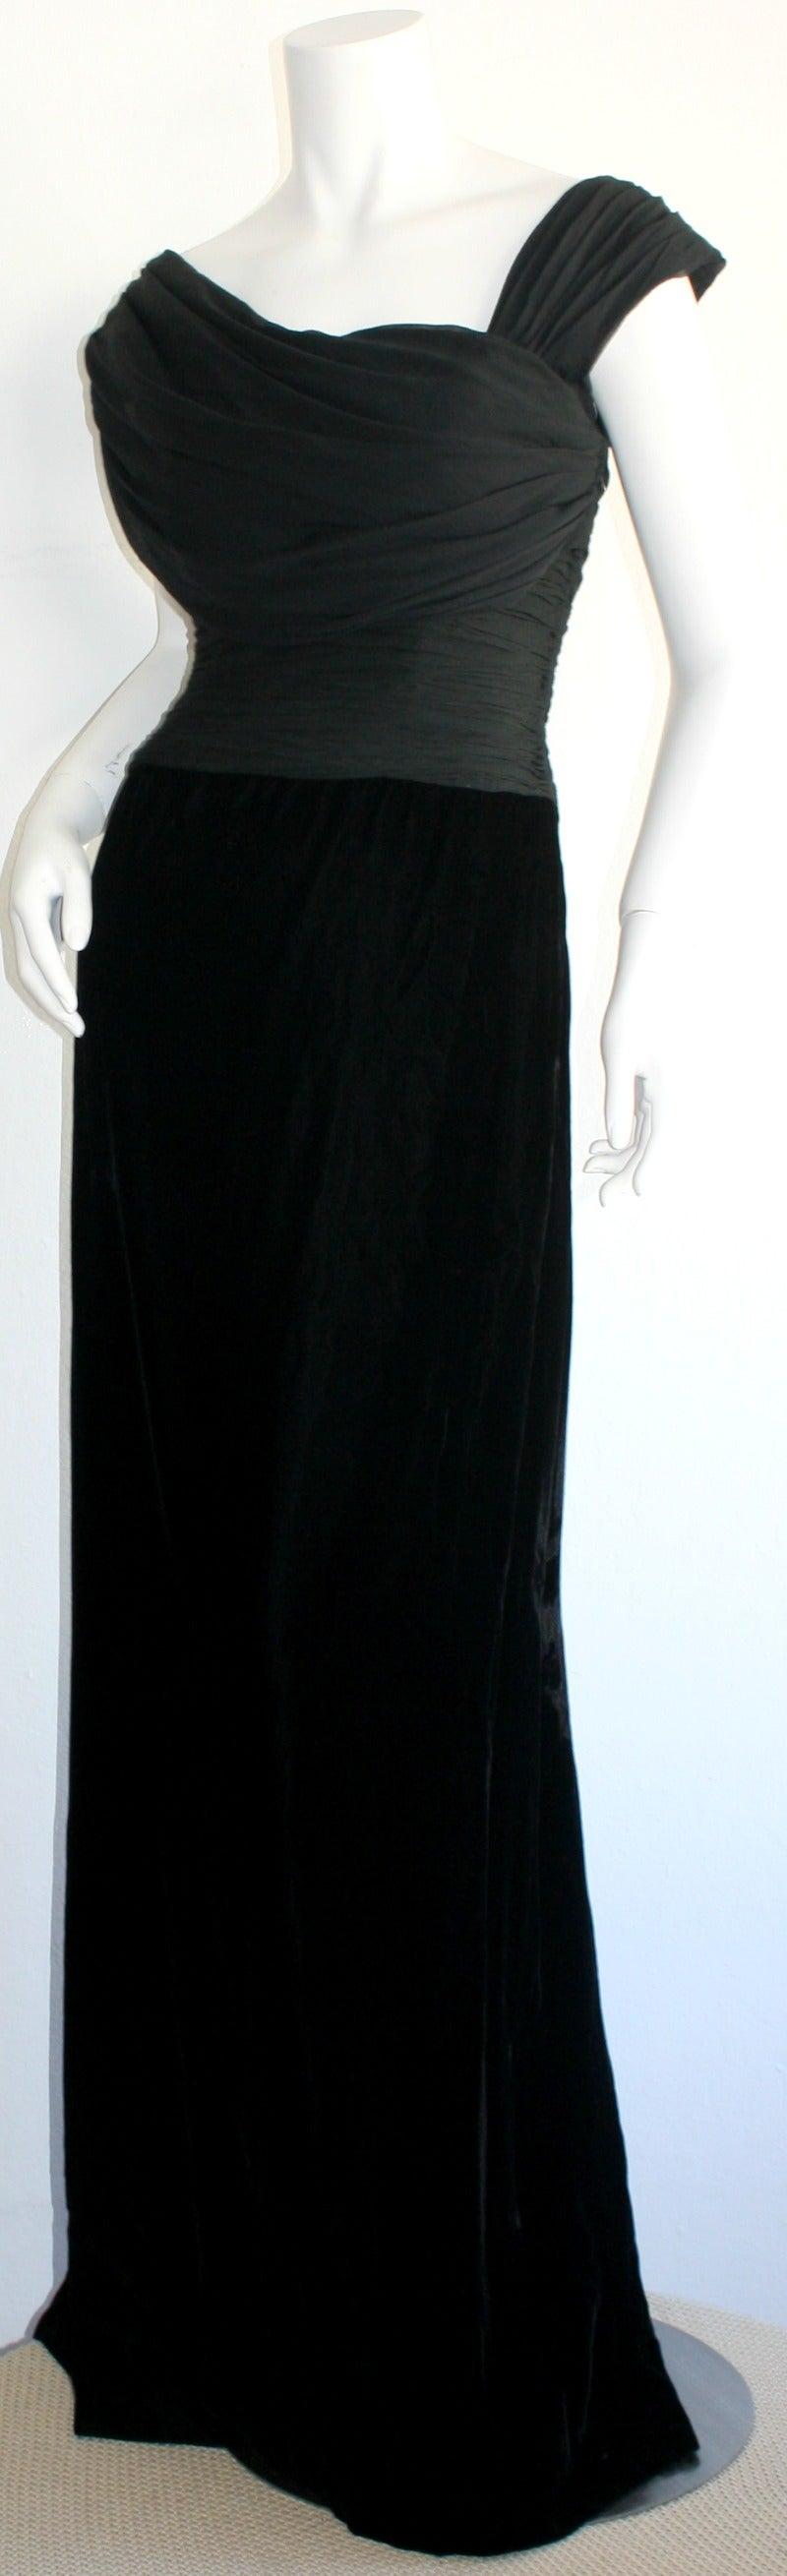 Remarkable Vintage Oscar de la Renta Black Velvet & Chiffon Grecian Gown 4